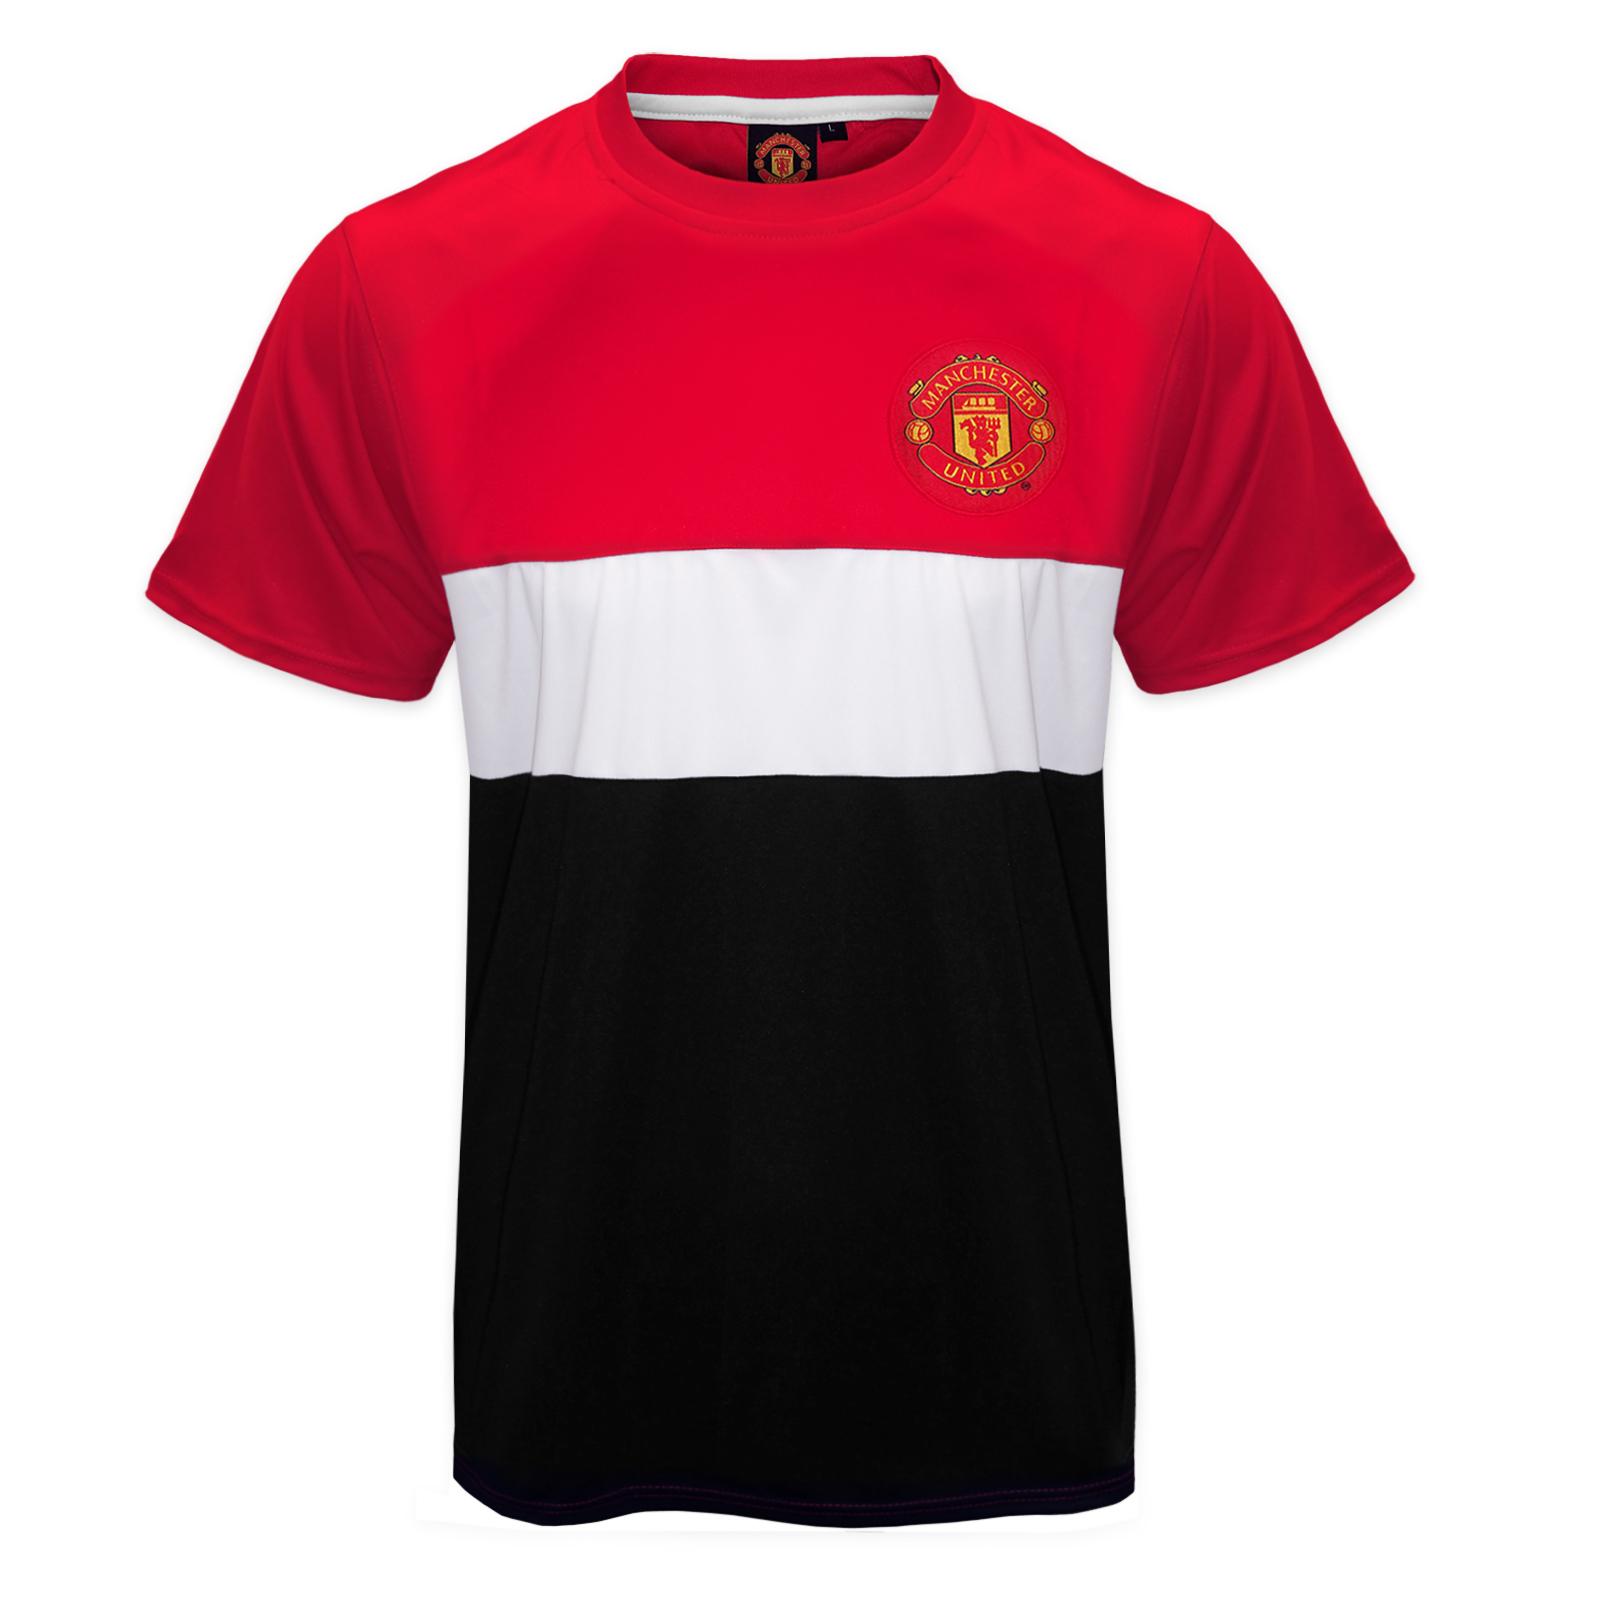 manchester united football club official soccer gift mens poly kit t shirt ebay. Black Bedroom Furniture Sets. Home Design Ideas